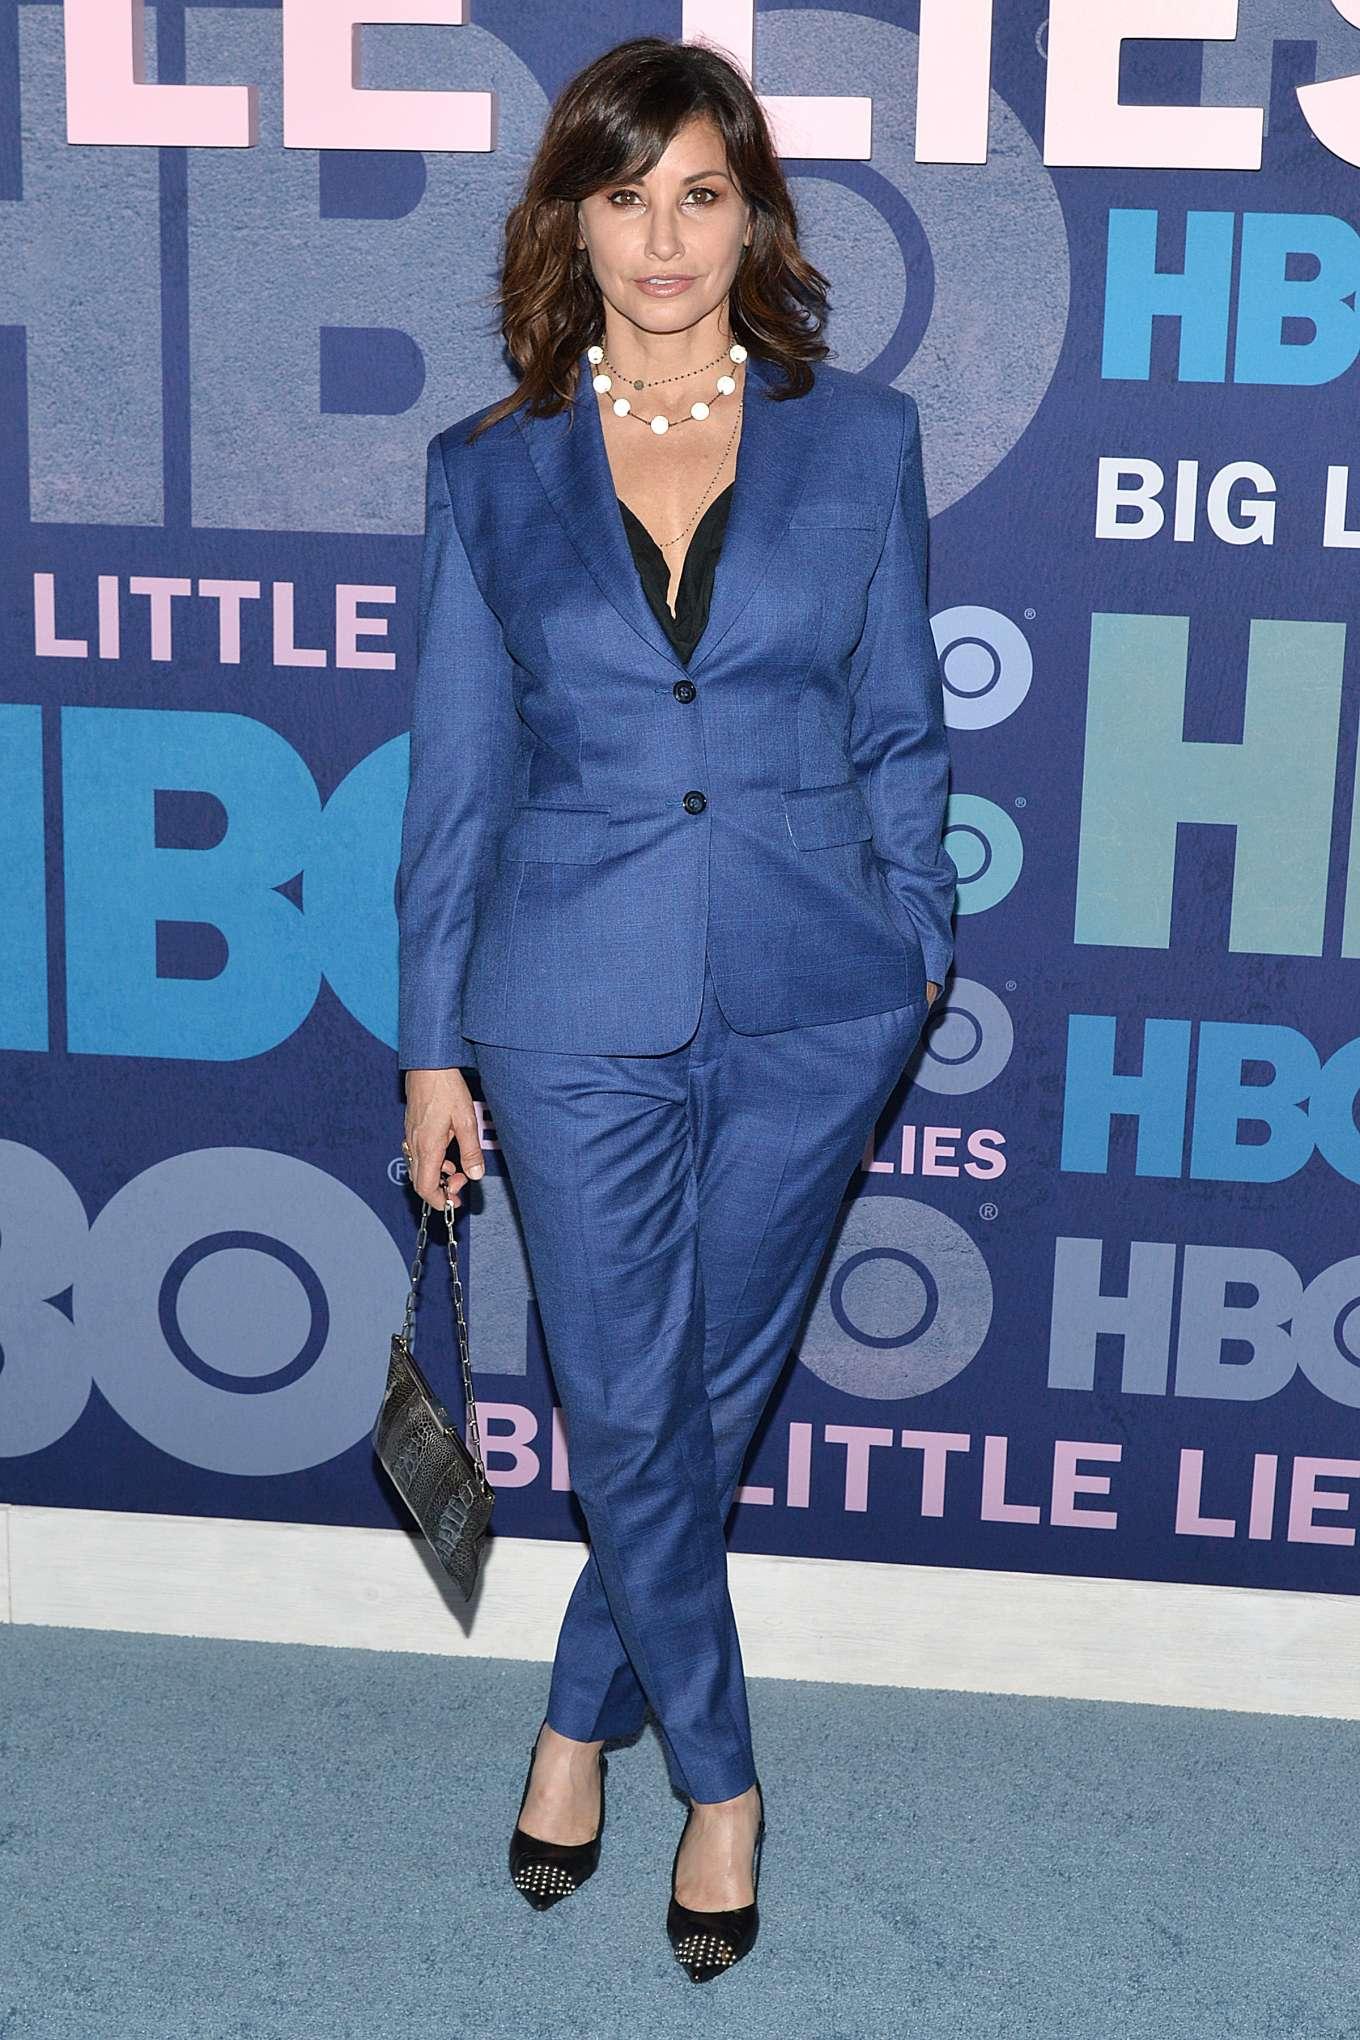 Gina Gershon 2019 : Gina Gershon: Big Little Lies Season 2 Premiere-02